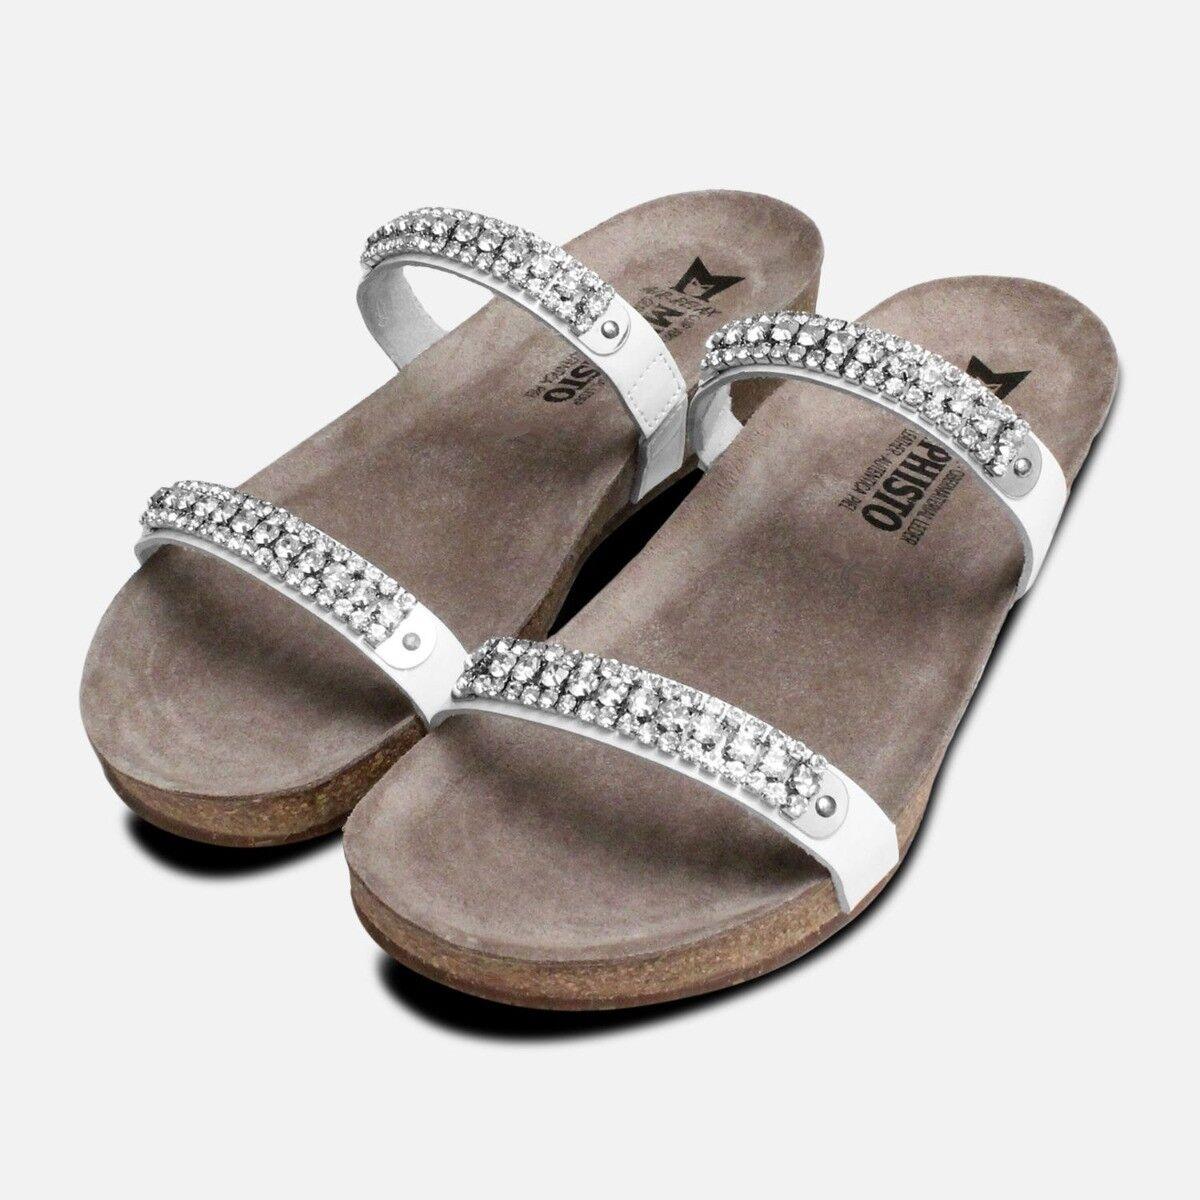 Weiß Crystal Patent Ivana Mephisto Sandals